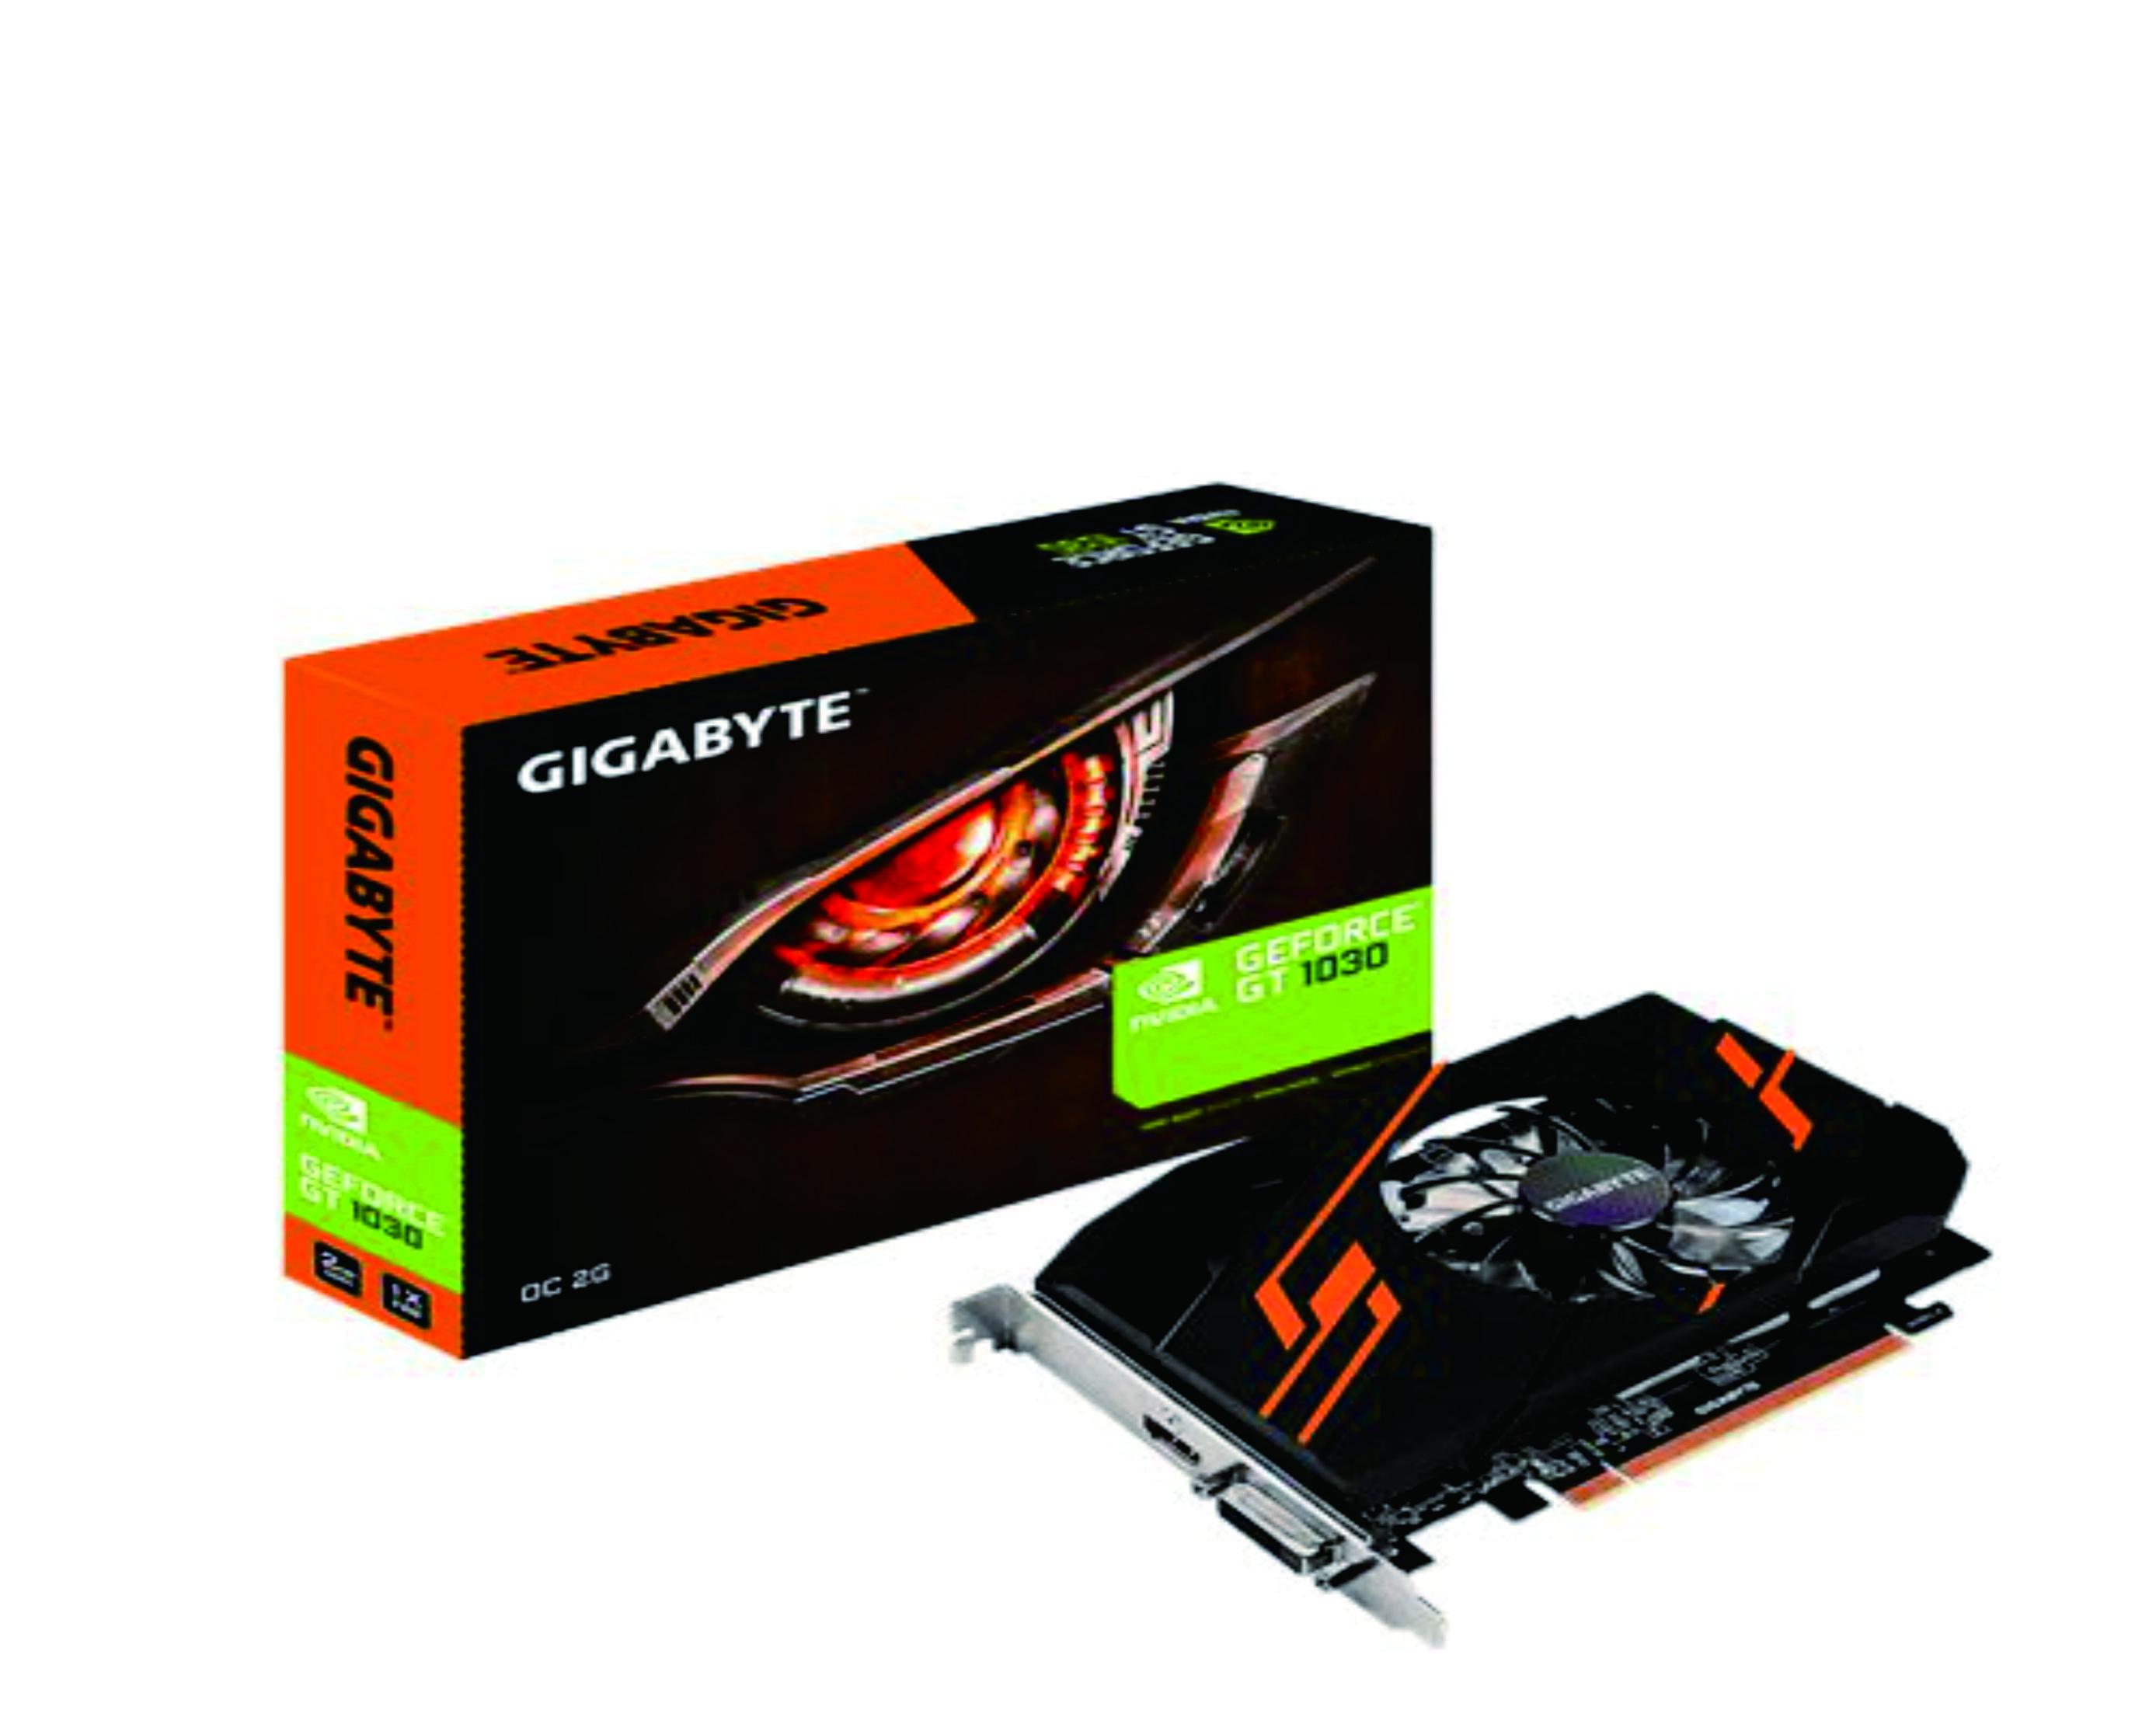 VGA GIGABYTE GEFORCE GT 1030 2GB